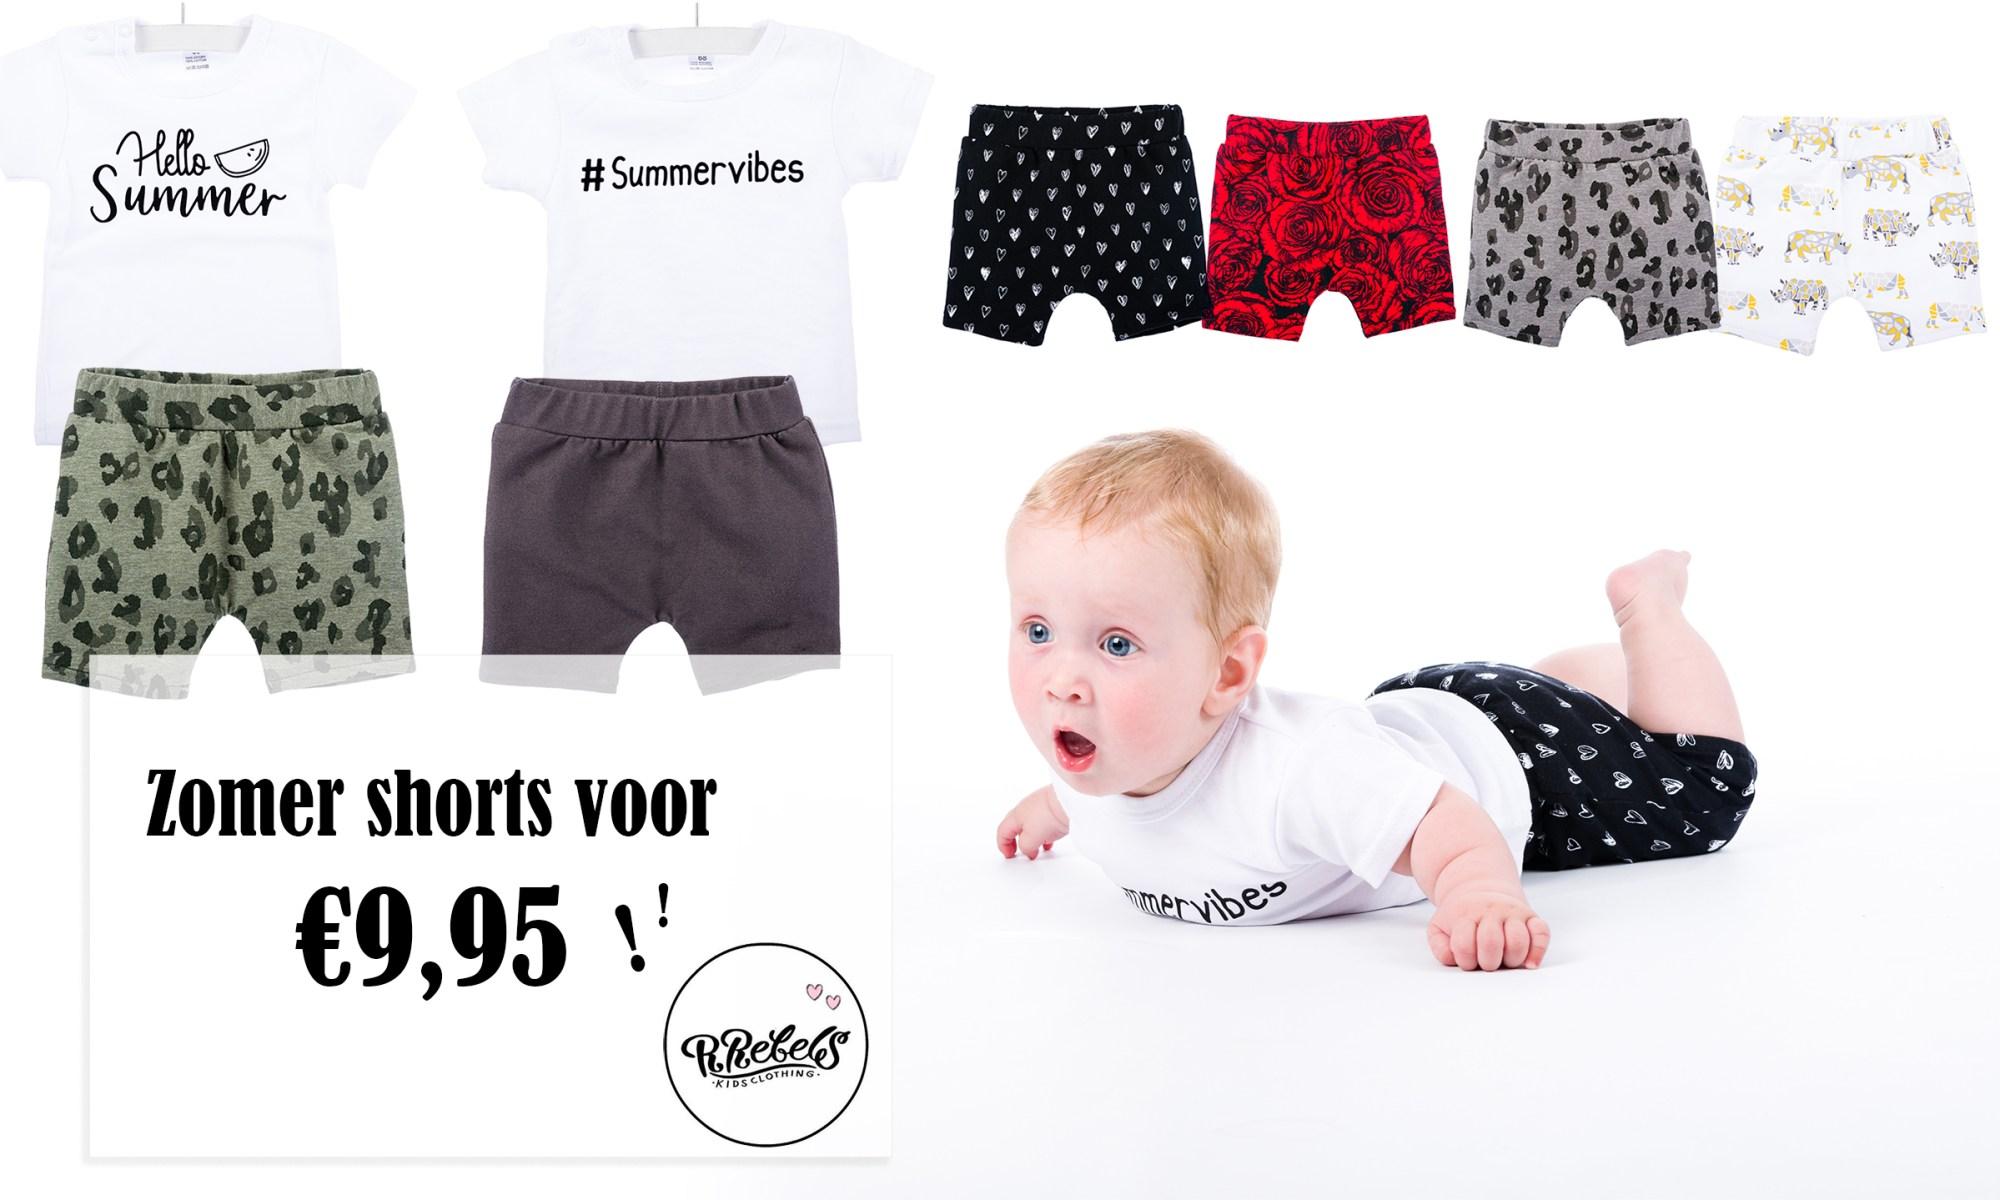 Zomer shorts R rebels kids clothing baby kleding broekje review brandrep foto's mama blog www.liefkleinwonder.nl rozen roses rood panter hartjes monochorme rozen